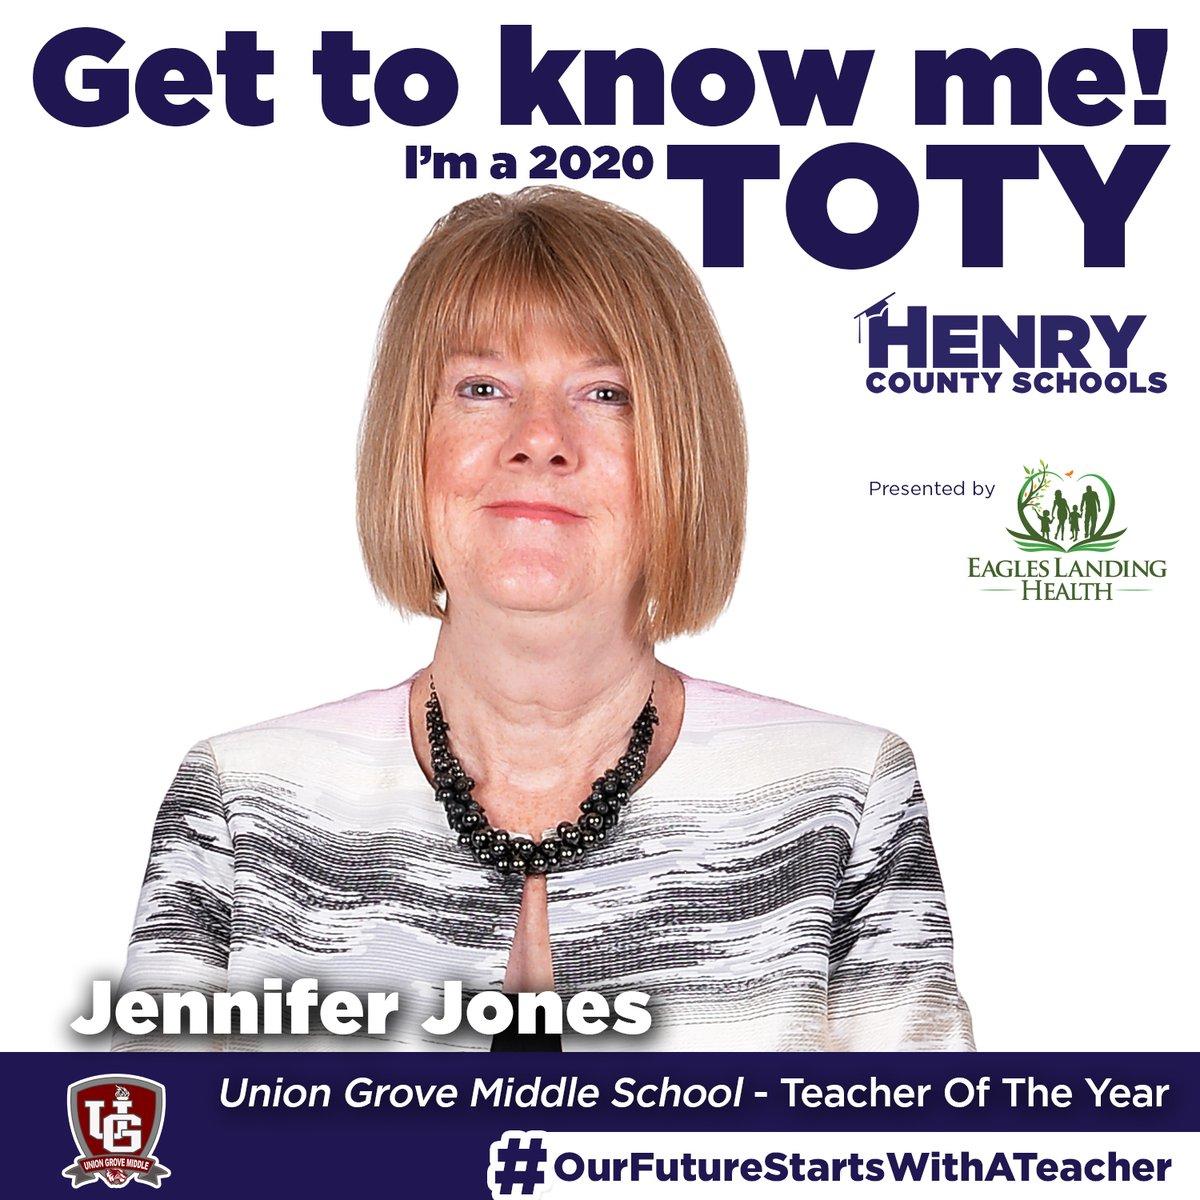 Our next Teacher of the Year, from @ugm_hcs, is Jennifer Jones!  Congrats to Ms. Osborne! #OurFutureStartsWithATeacher  TOTY Sponsor: @ELHgeorgia